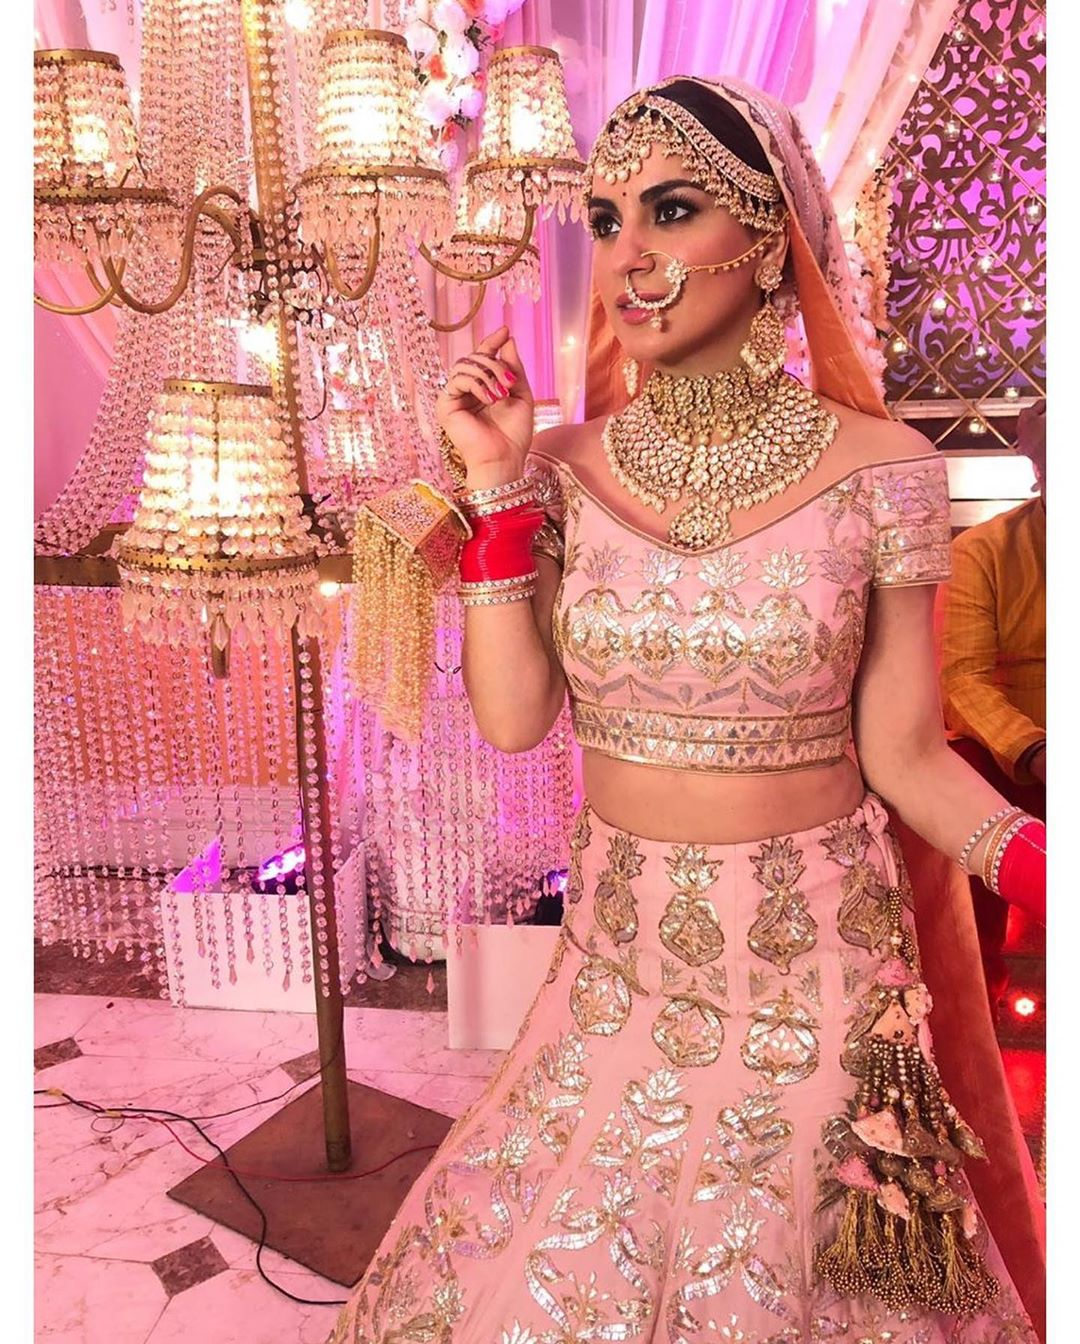 Bollywood Tadka,श्रद्धा आर्या इमेज,श्रद्धा आर्या फोटो,श्रद्धा आर्या पिक्चर